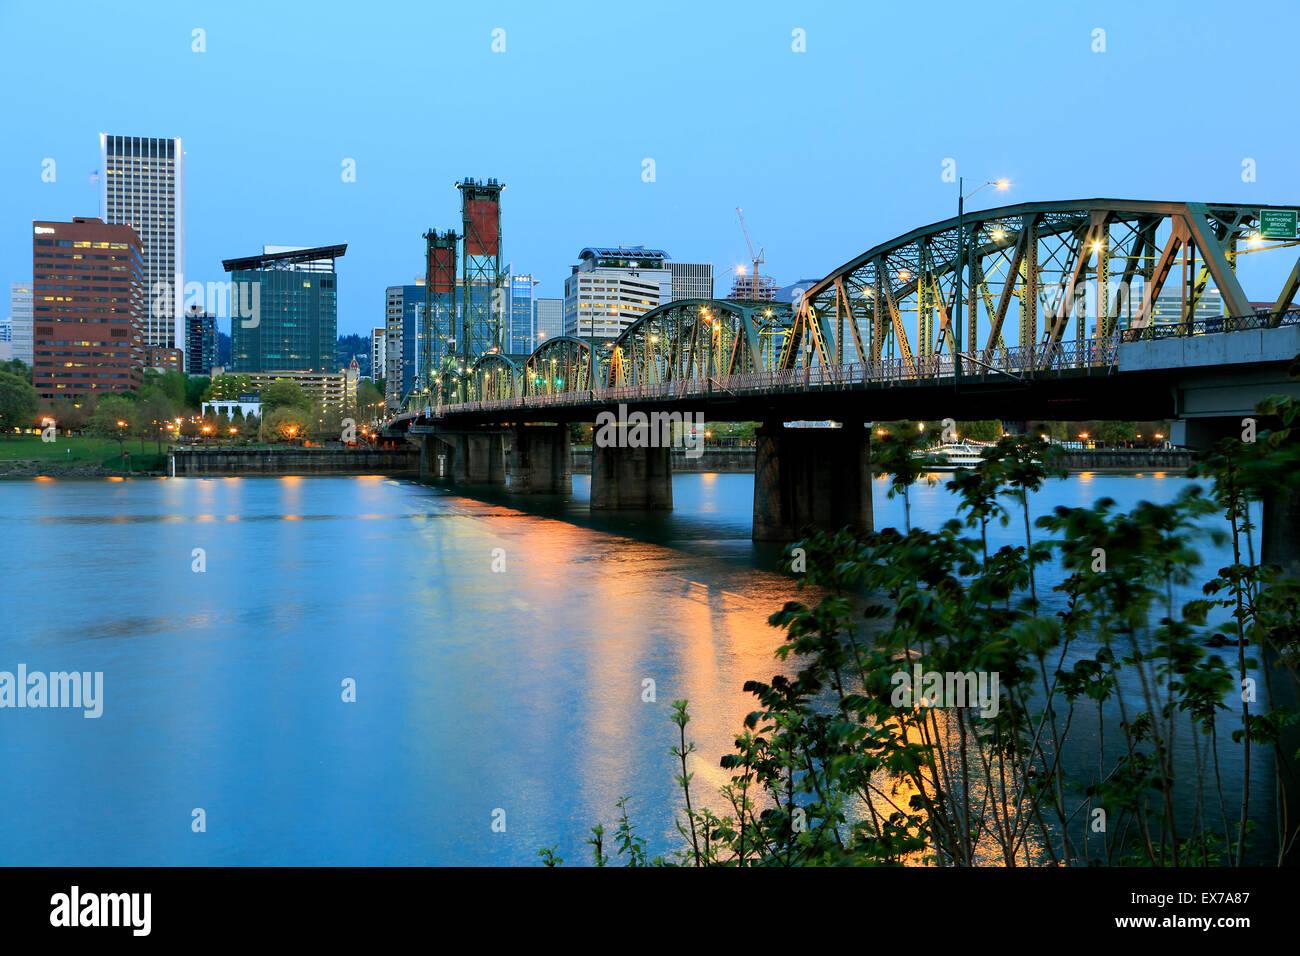 Skyline of Portland, Hawthorne Bridge and Willamette River, Portland, Oregon USA - Stock Image